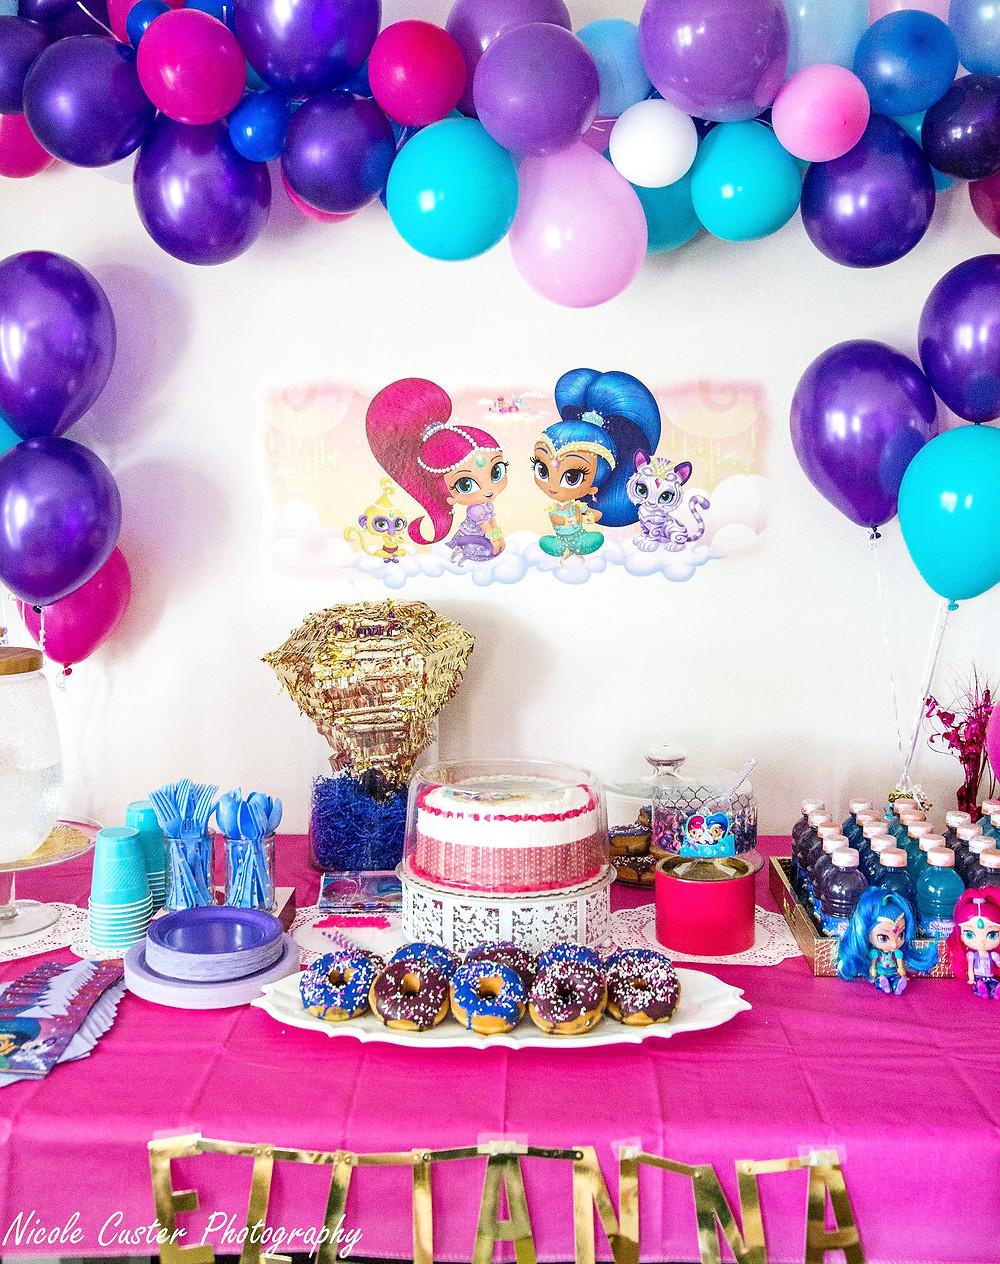 #shimmerandshine #birthdayparty #pinkpurpleteal